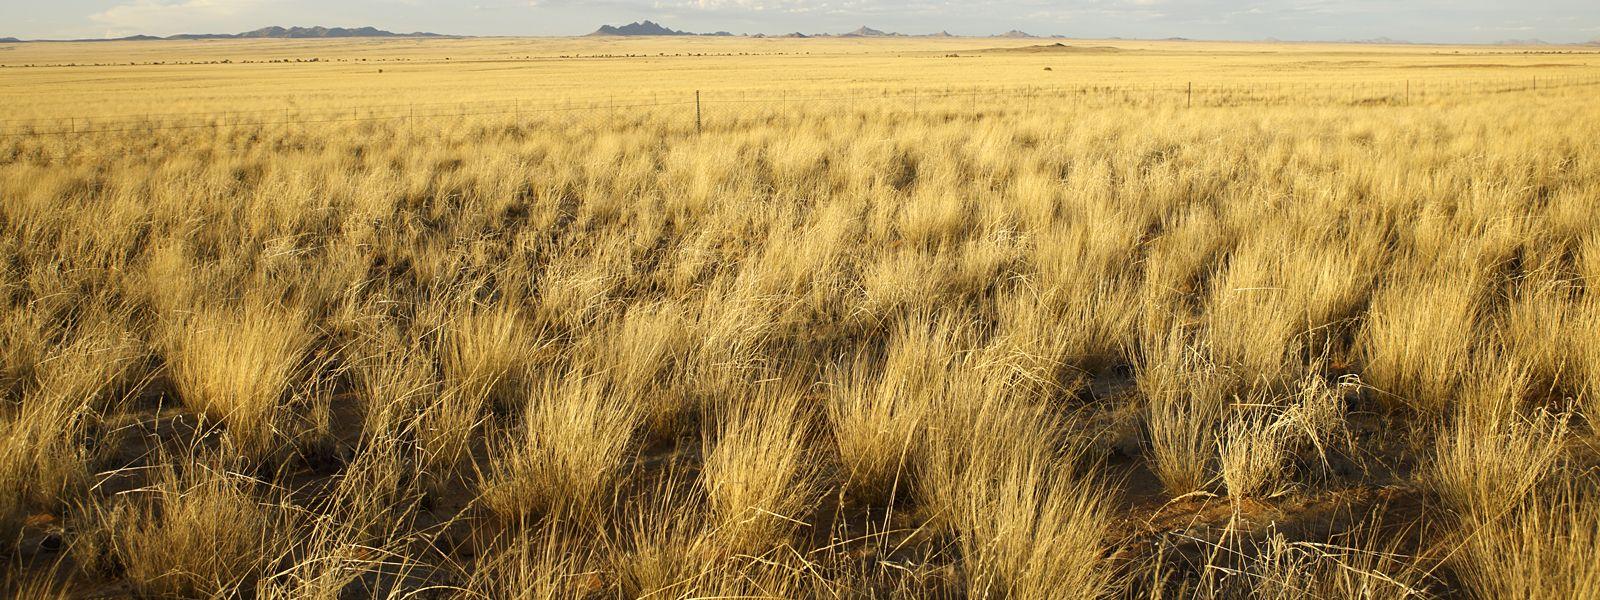 Grasslands Habitats WWF Grassland habitat, Grassland